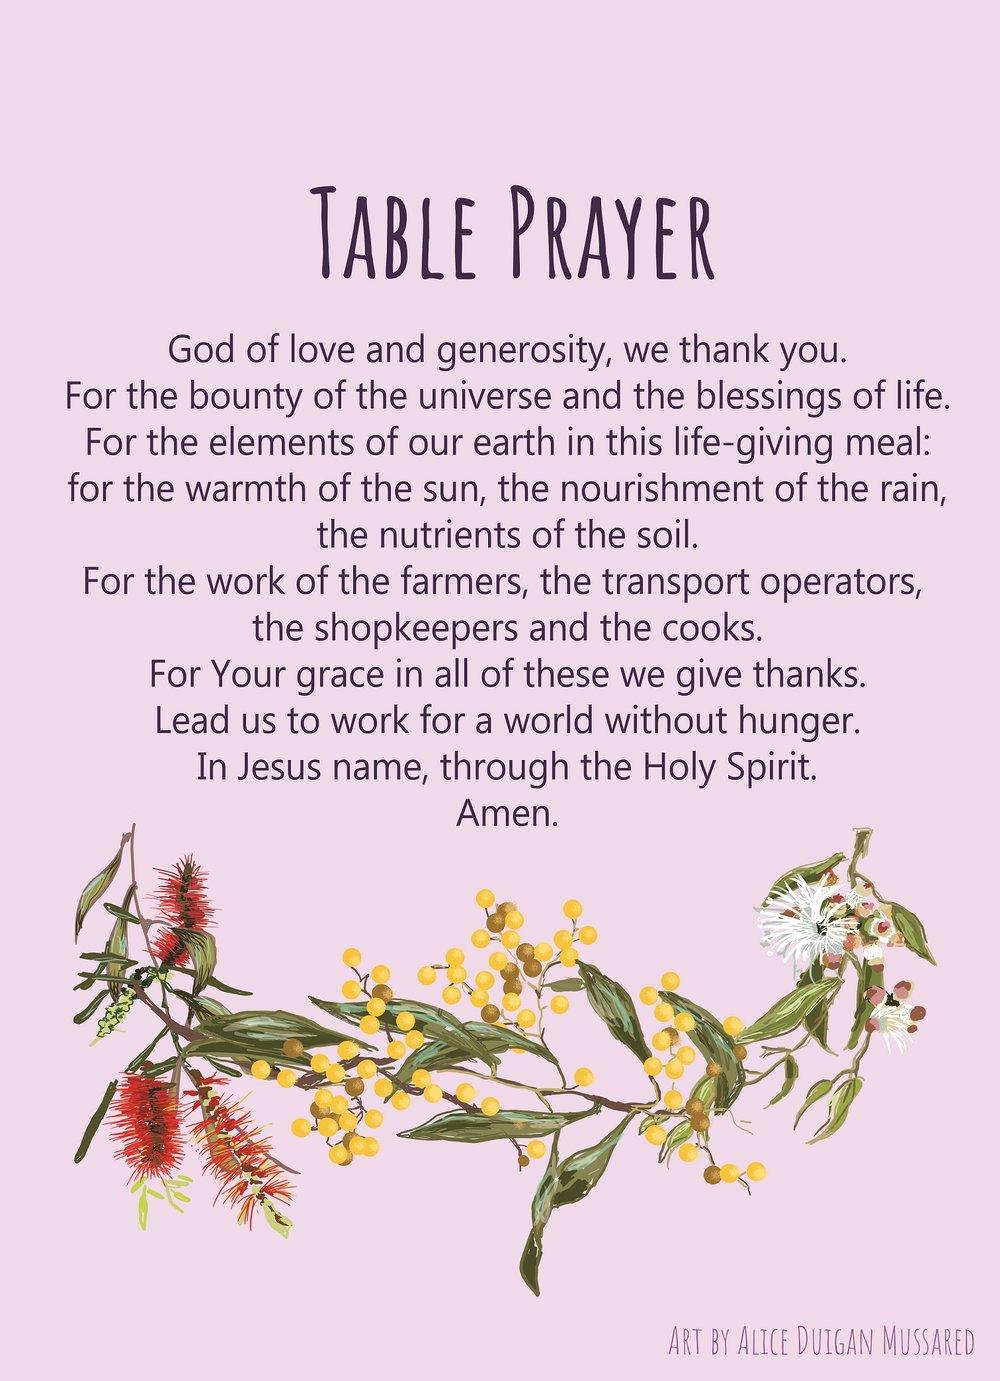 Table+Prayer+side_13July2017.jpg